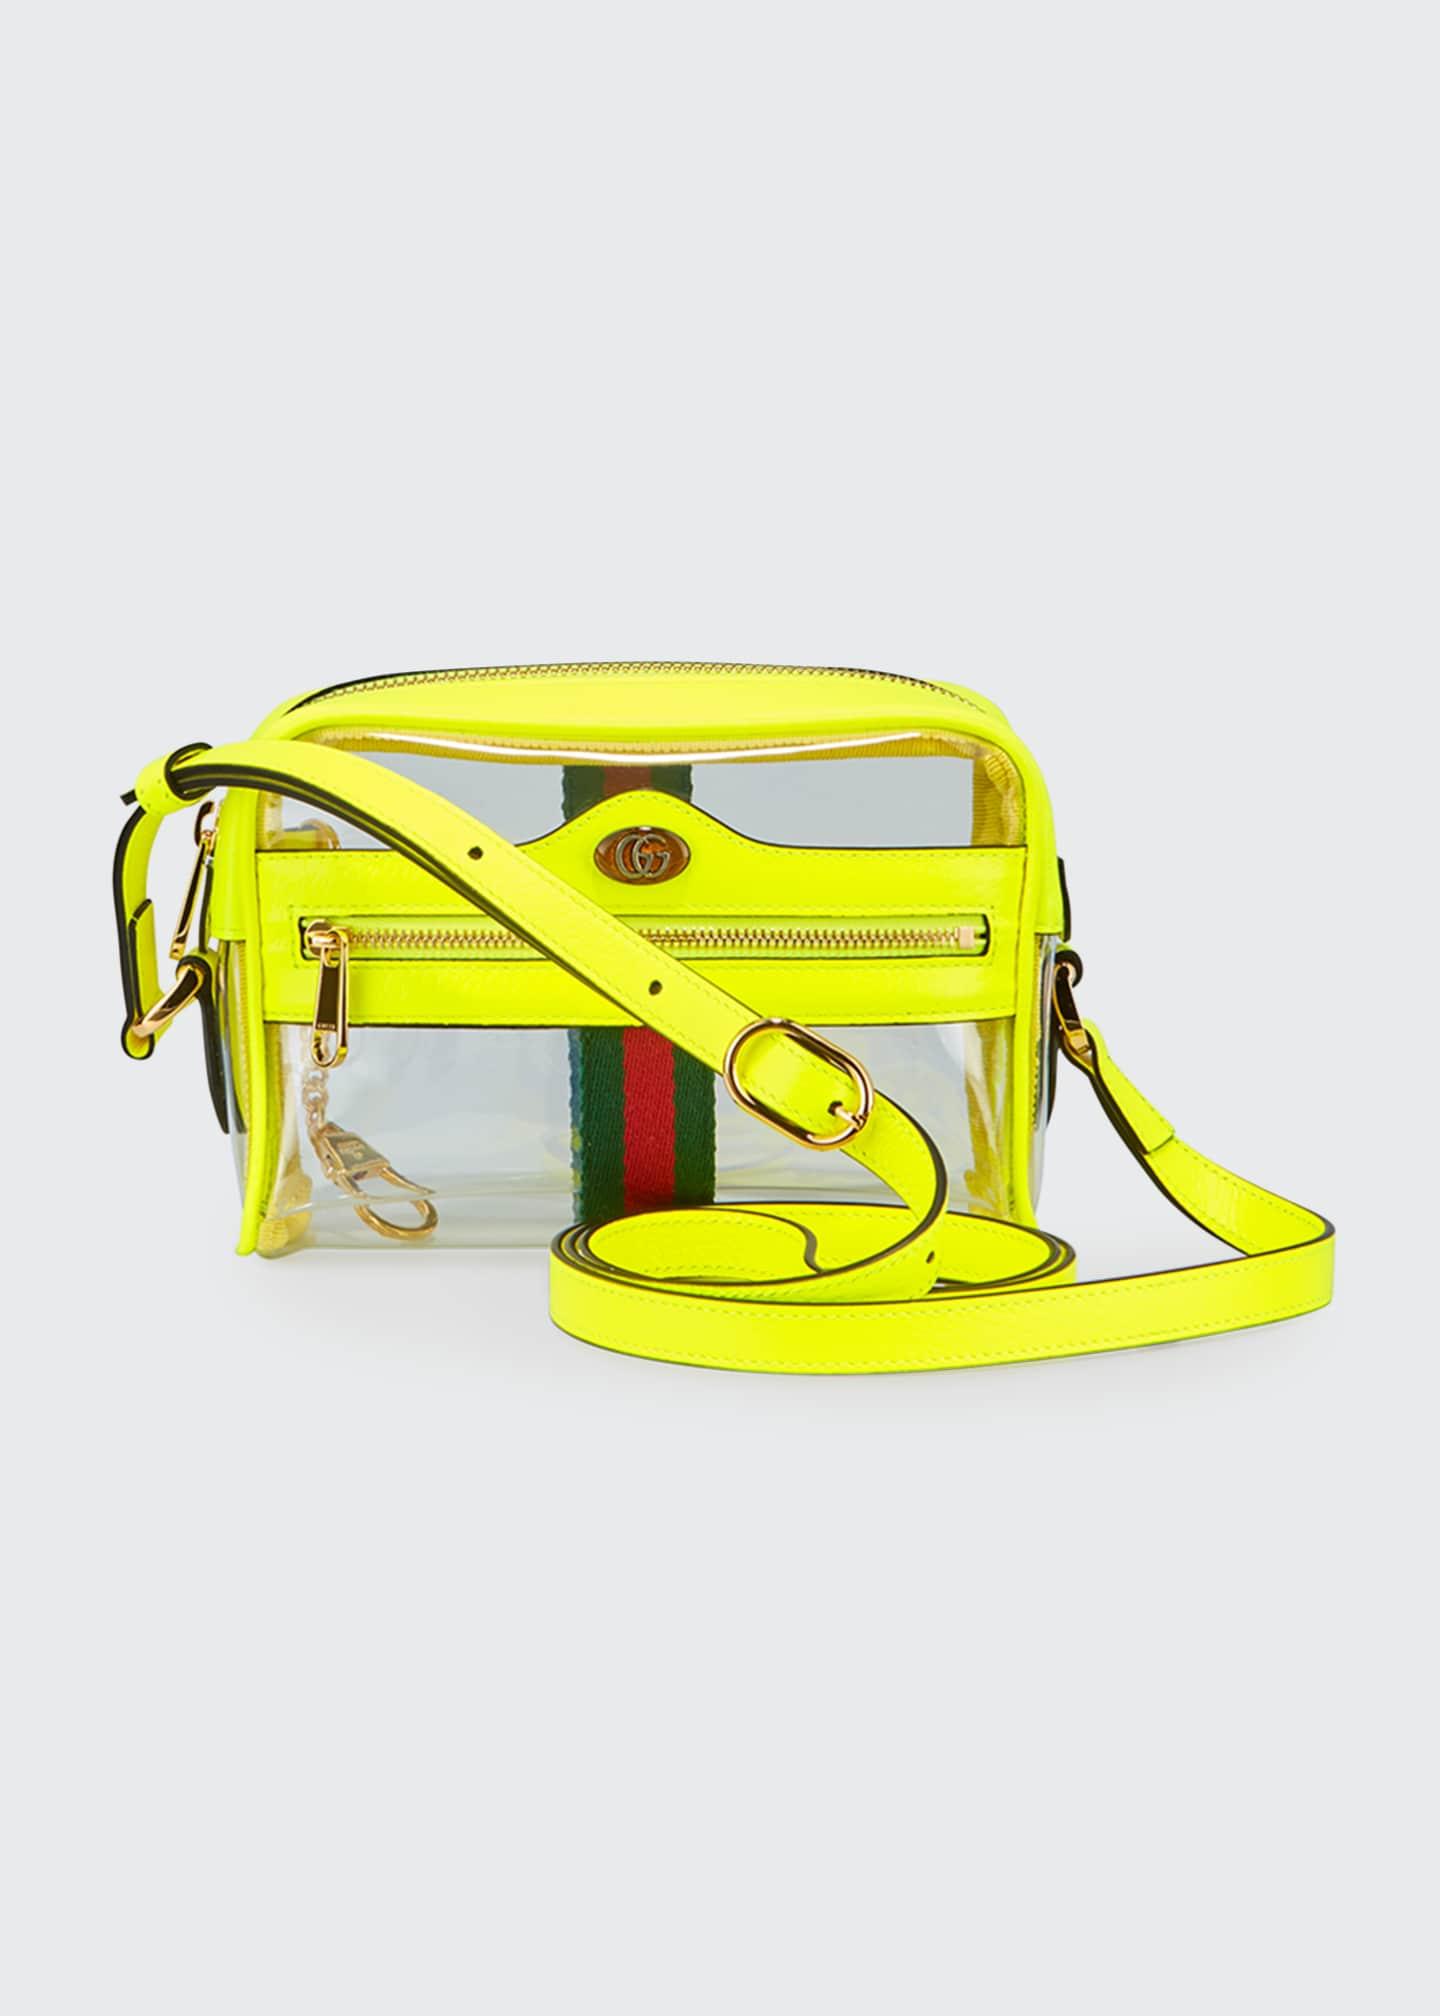 Gucci Ophidia Mini See-Through Vinyl Crossbody Bag